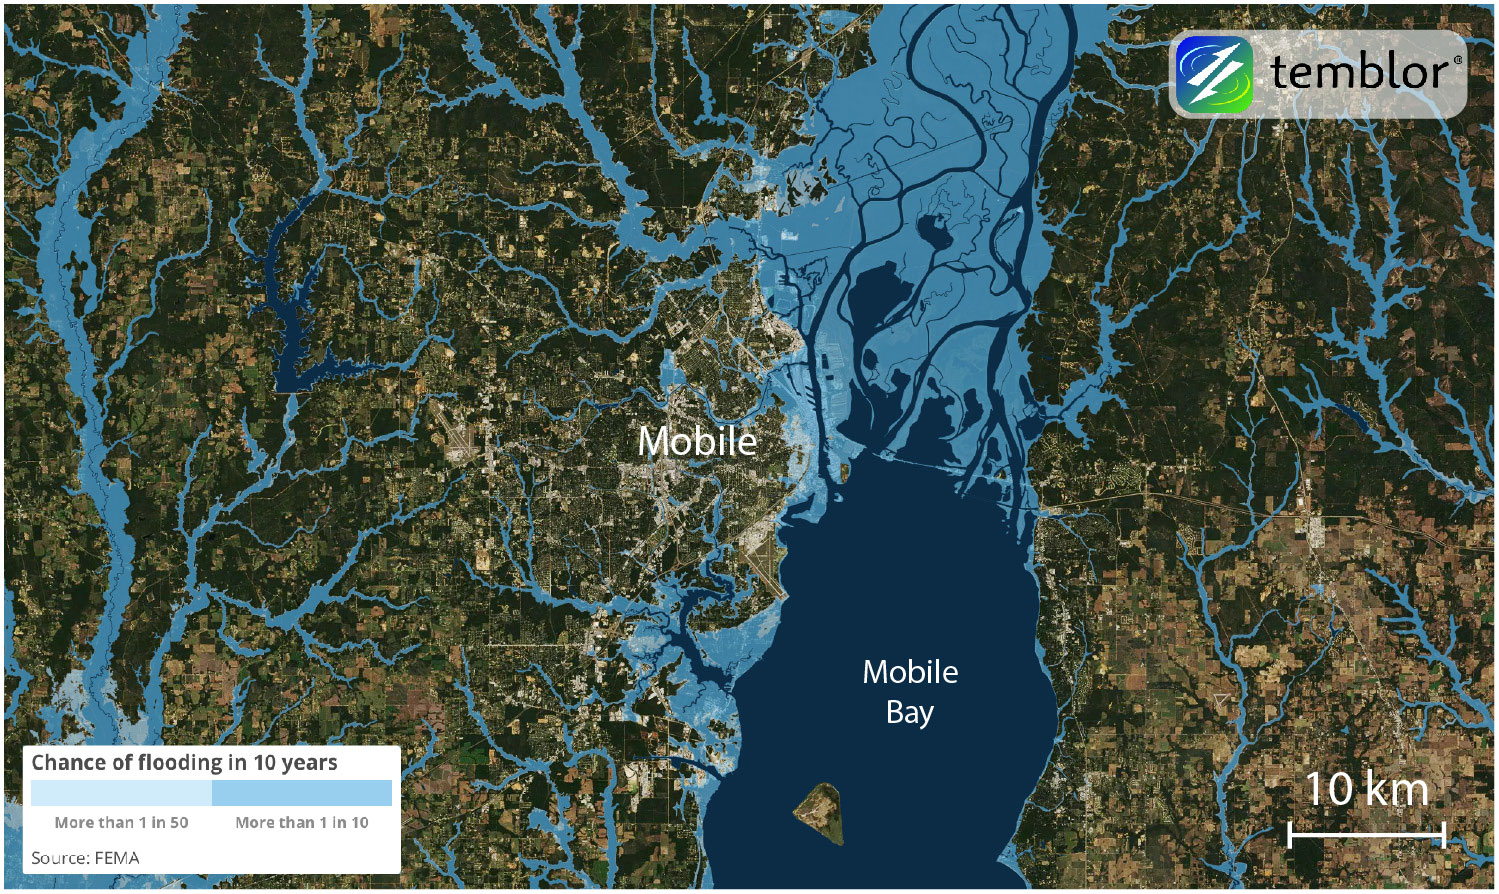 Mobile-alabama-flood-map